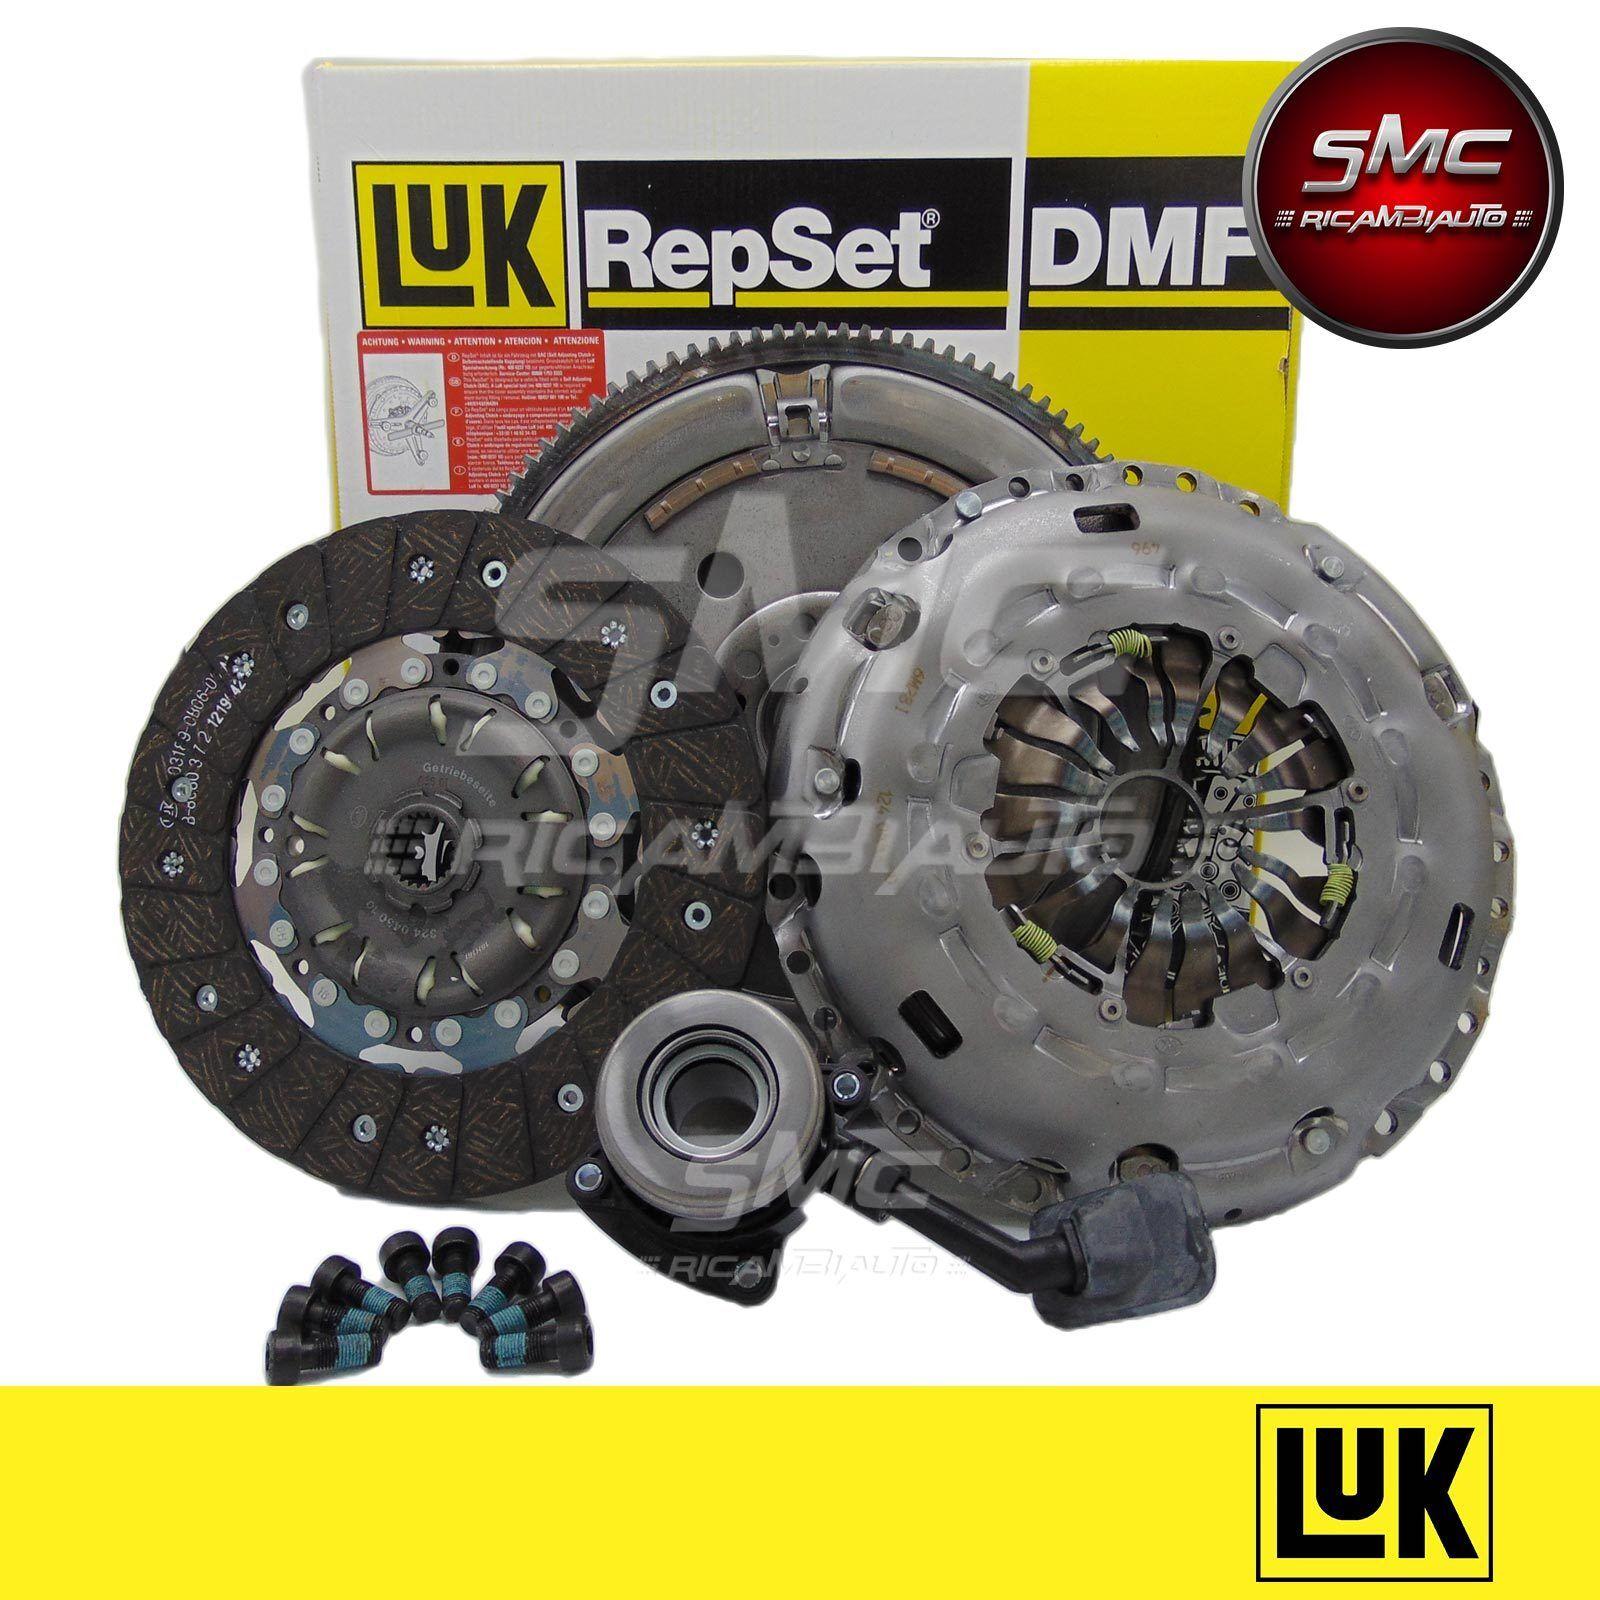 LUK 623122100 Kupplungssatz LuK RepSet